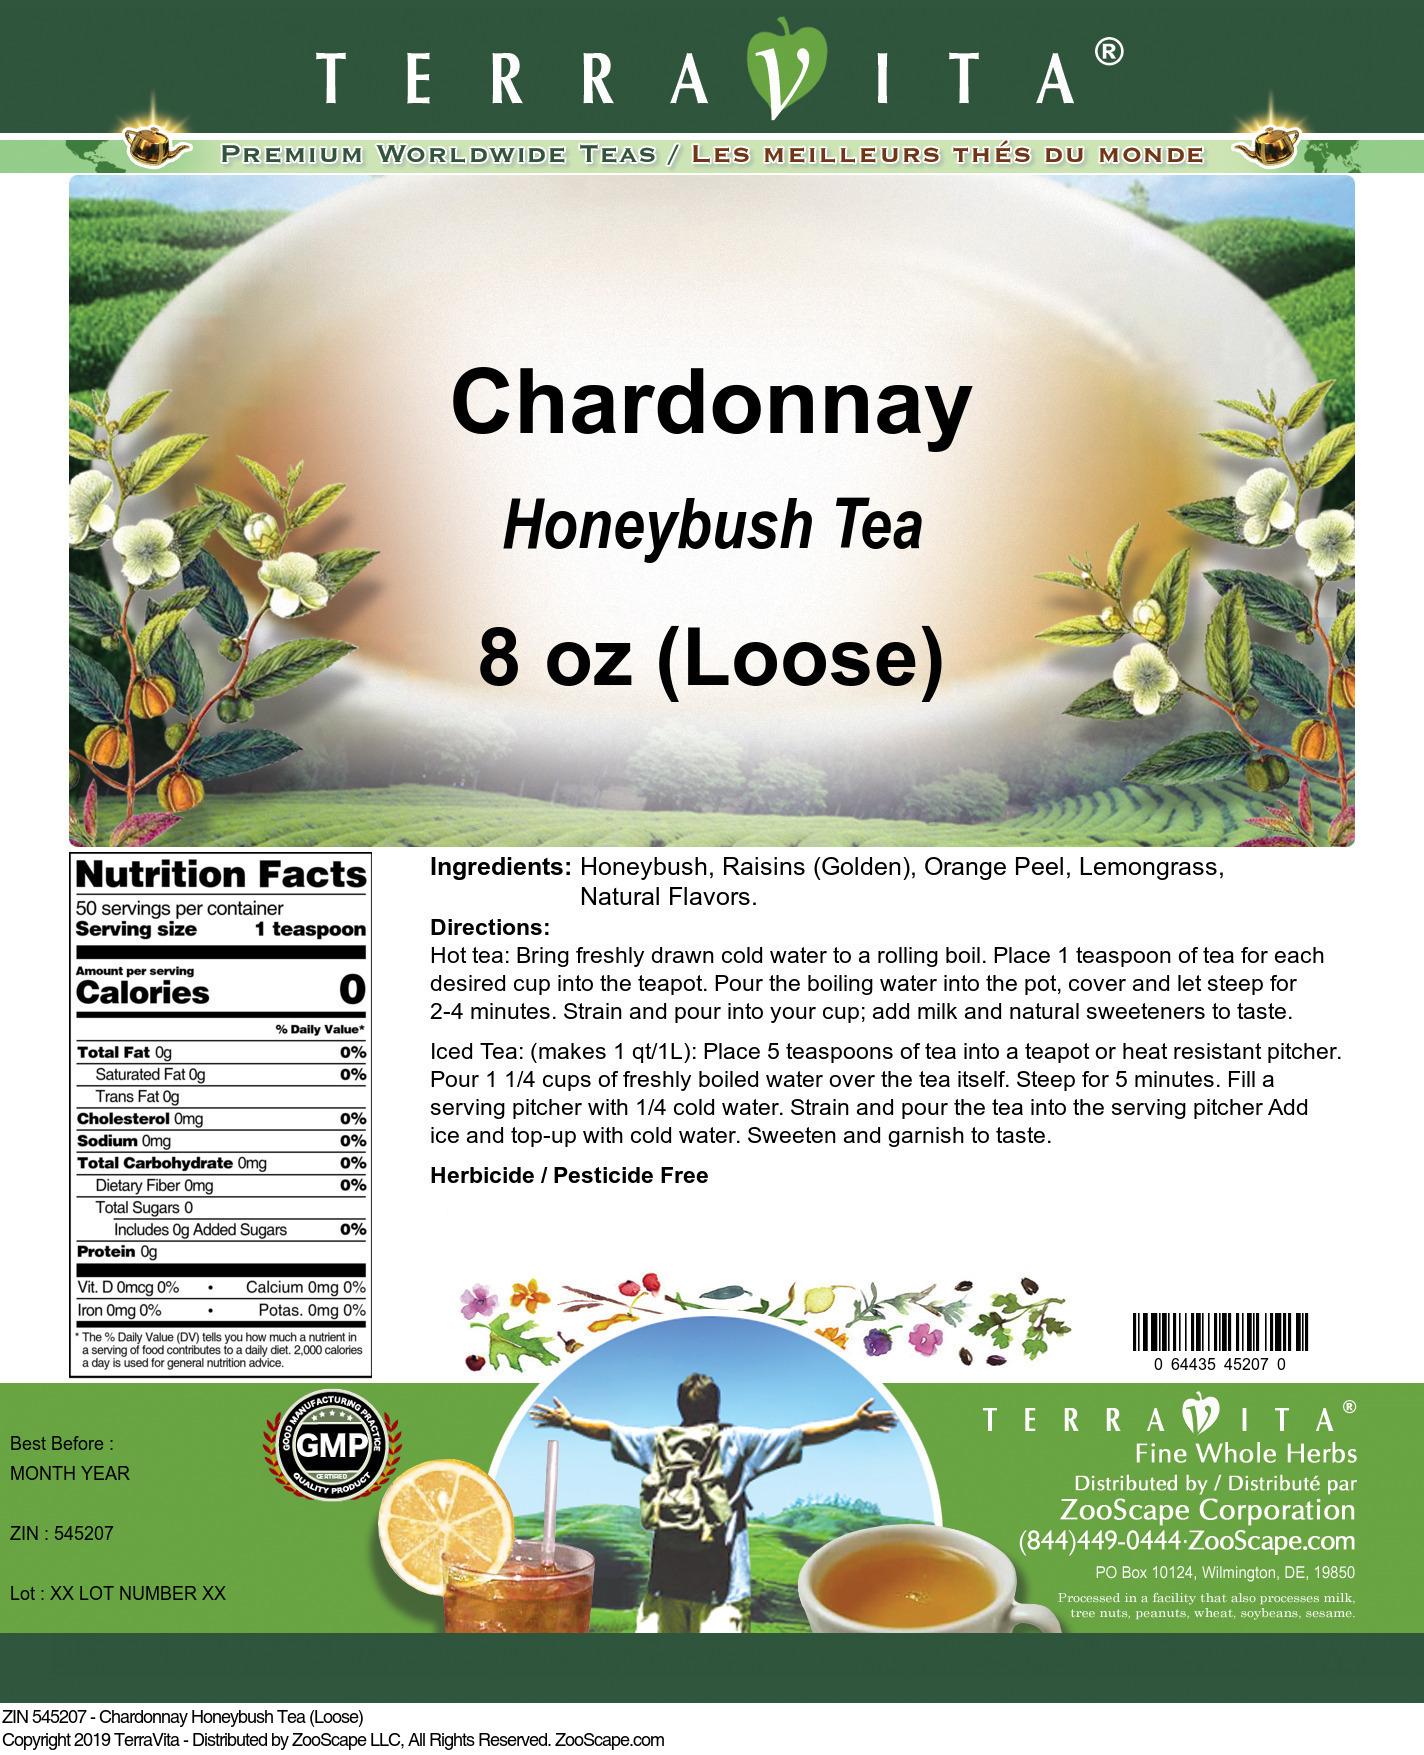 Chardonnay Honeybush Tea (Loose)